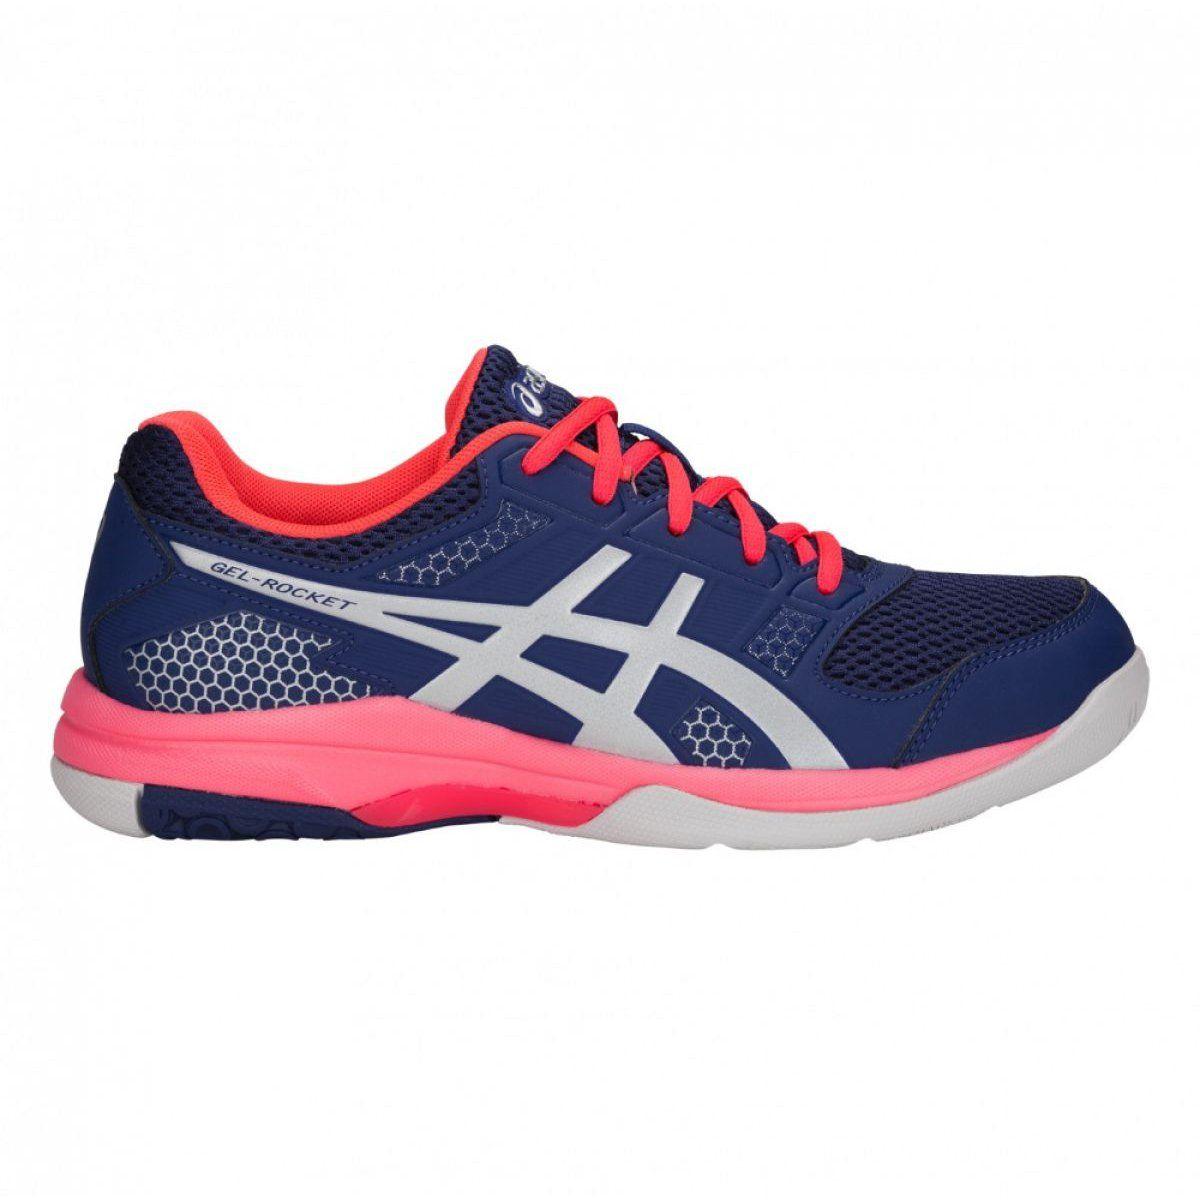 Volleyball Shoes Asics Gel Rocket 8 W B756y 400 Navy Navy Asics Volleyball Shoes Asics Women